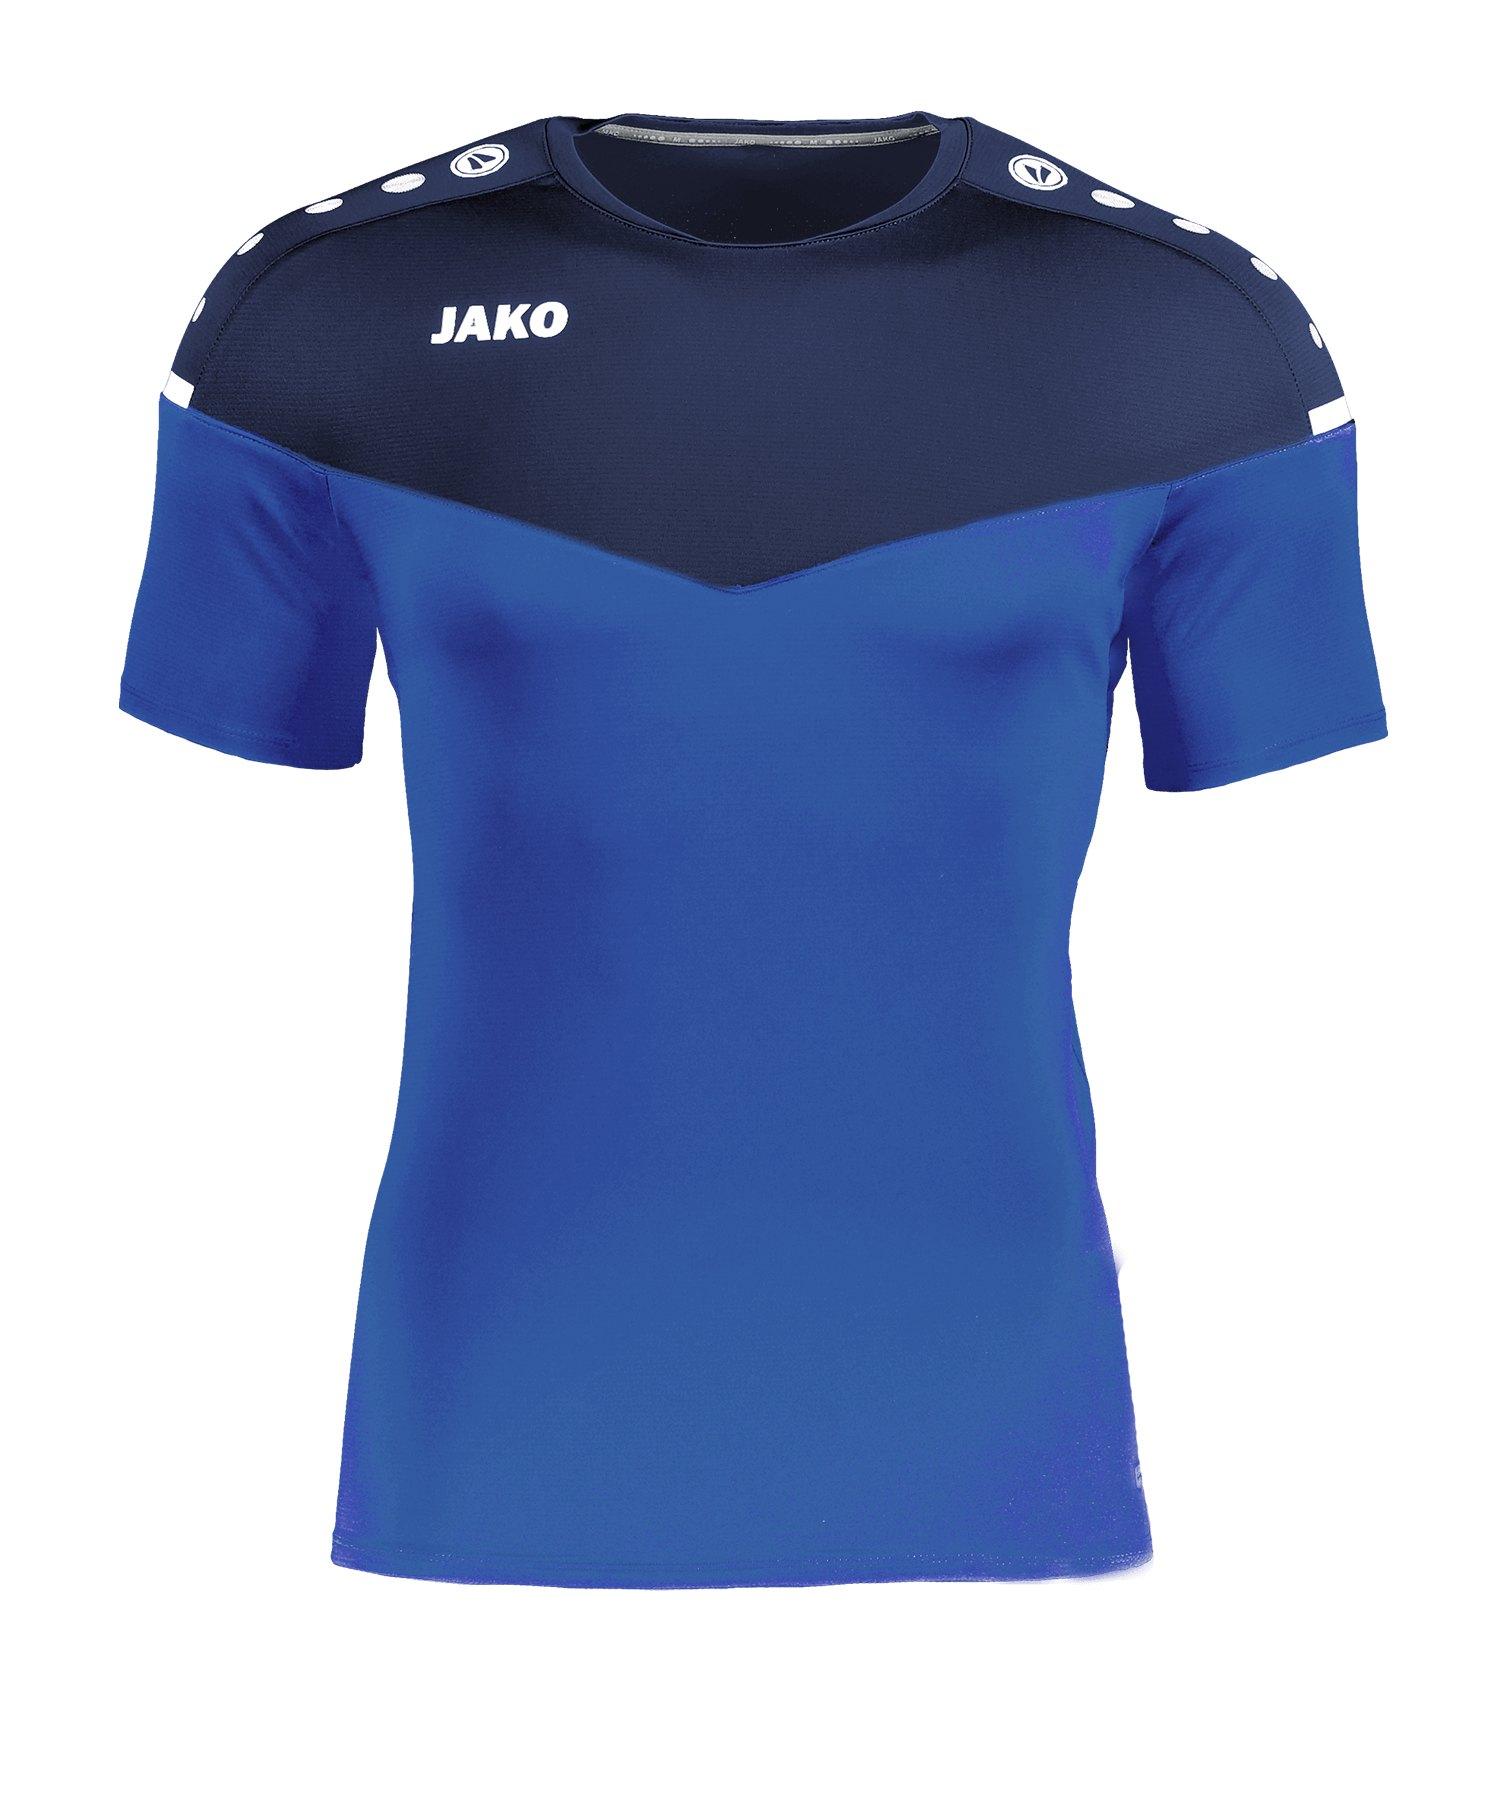 Jako Champ 2.0 T-Shirt Damen Blau F49 - blau